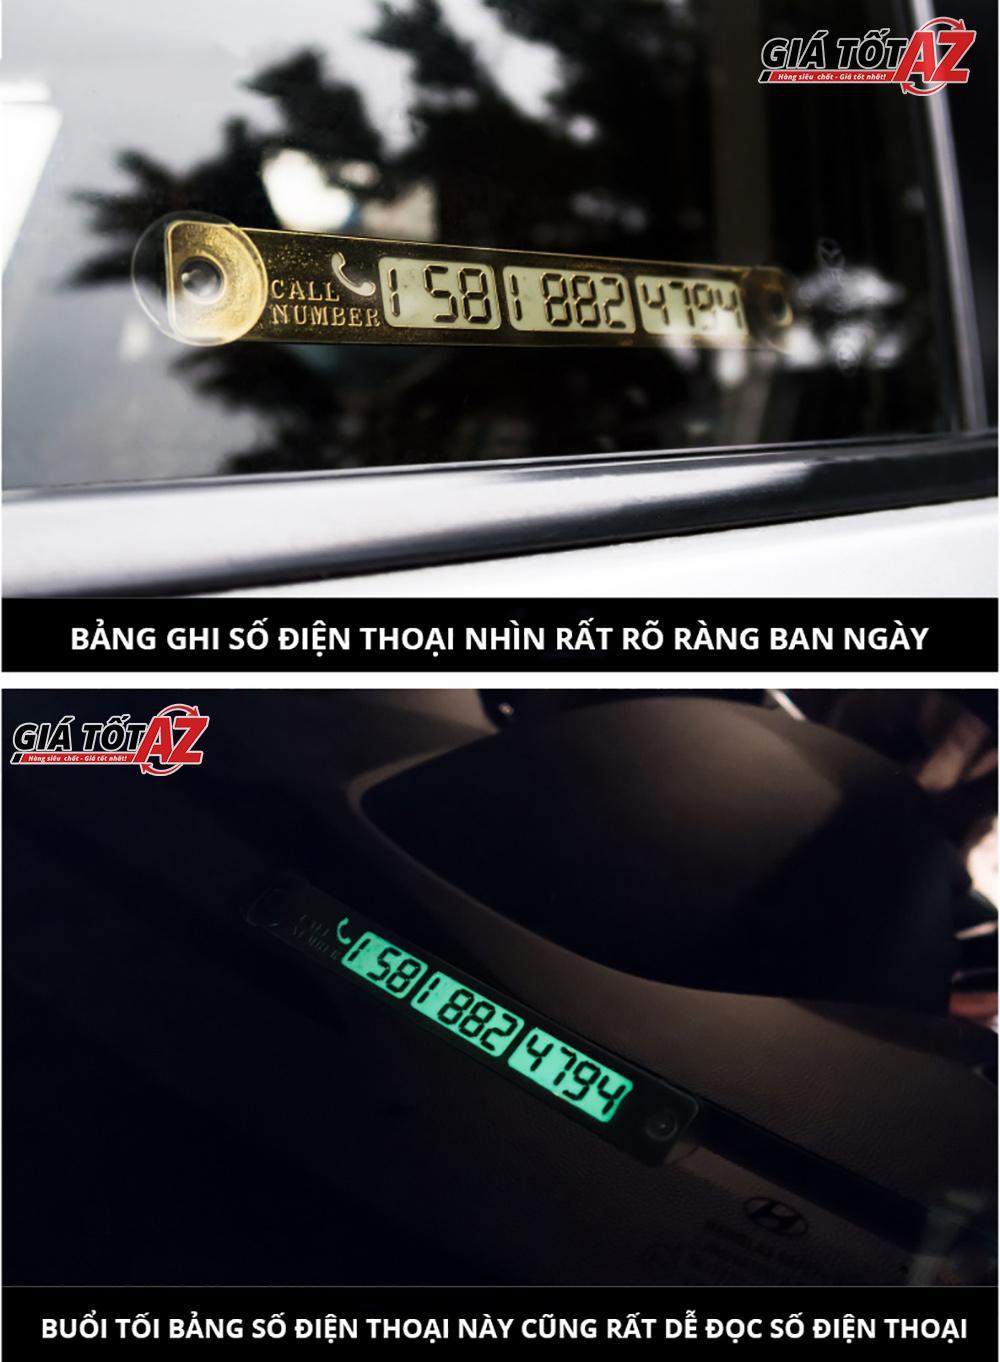 bang-gan-so-dien-thoai-dung-cho-xe-o-to-03.jpg